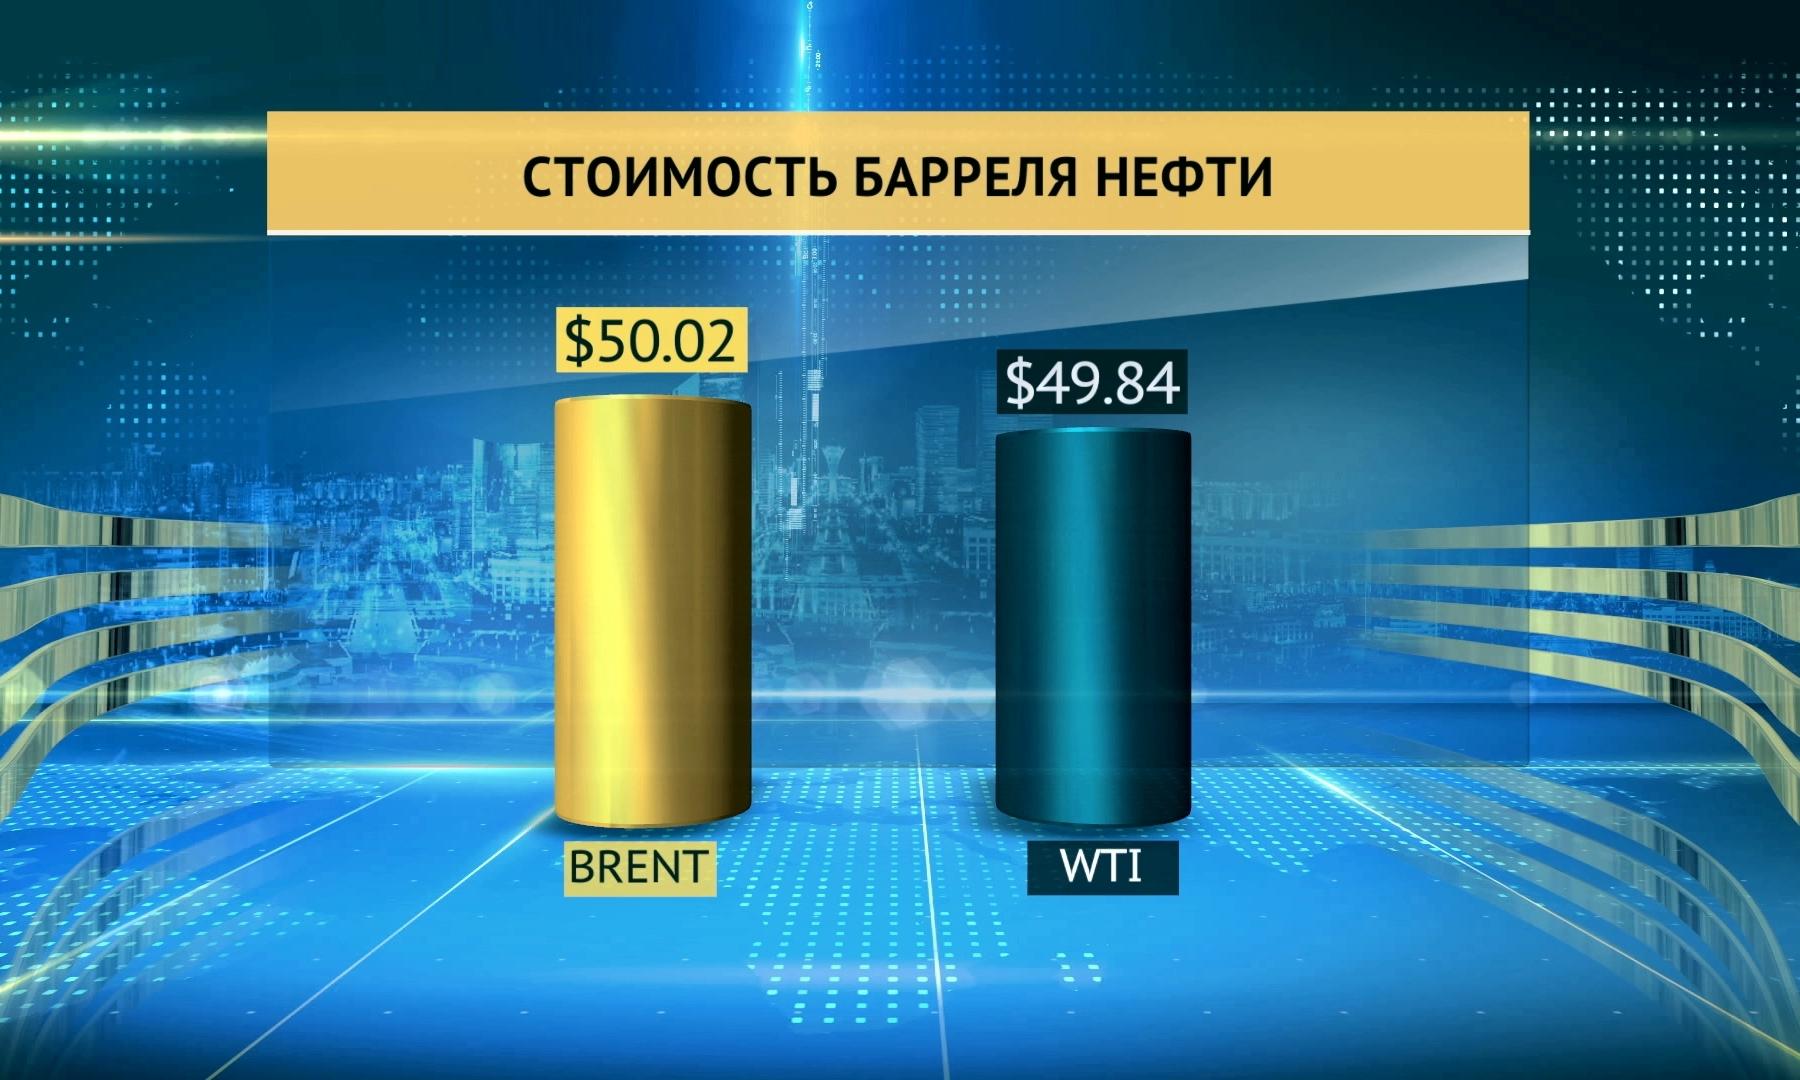 первом этаже барл нефти цена на сегодня зависимости